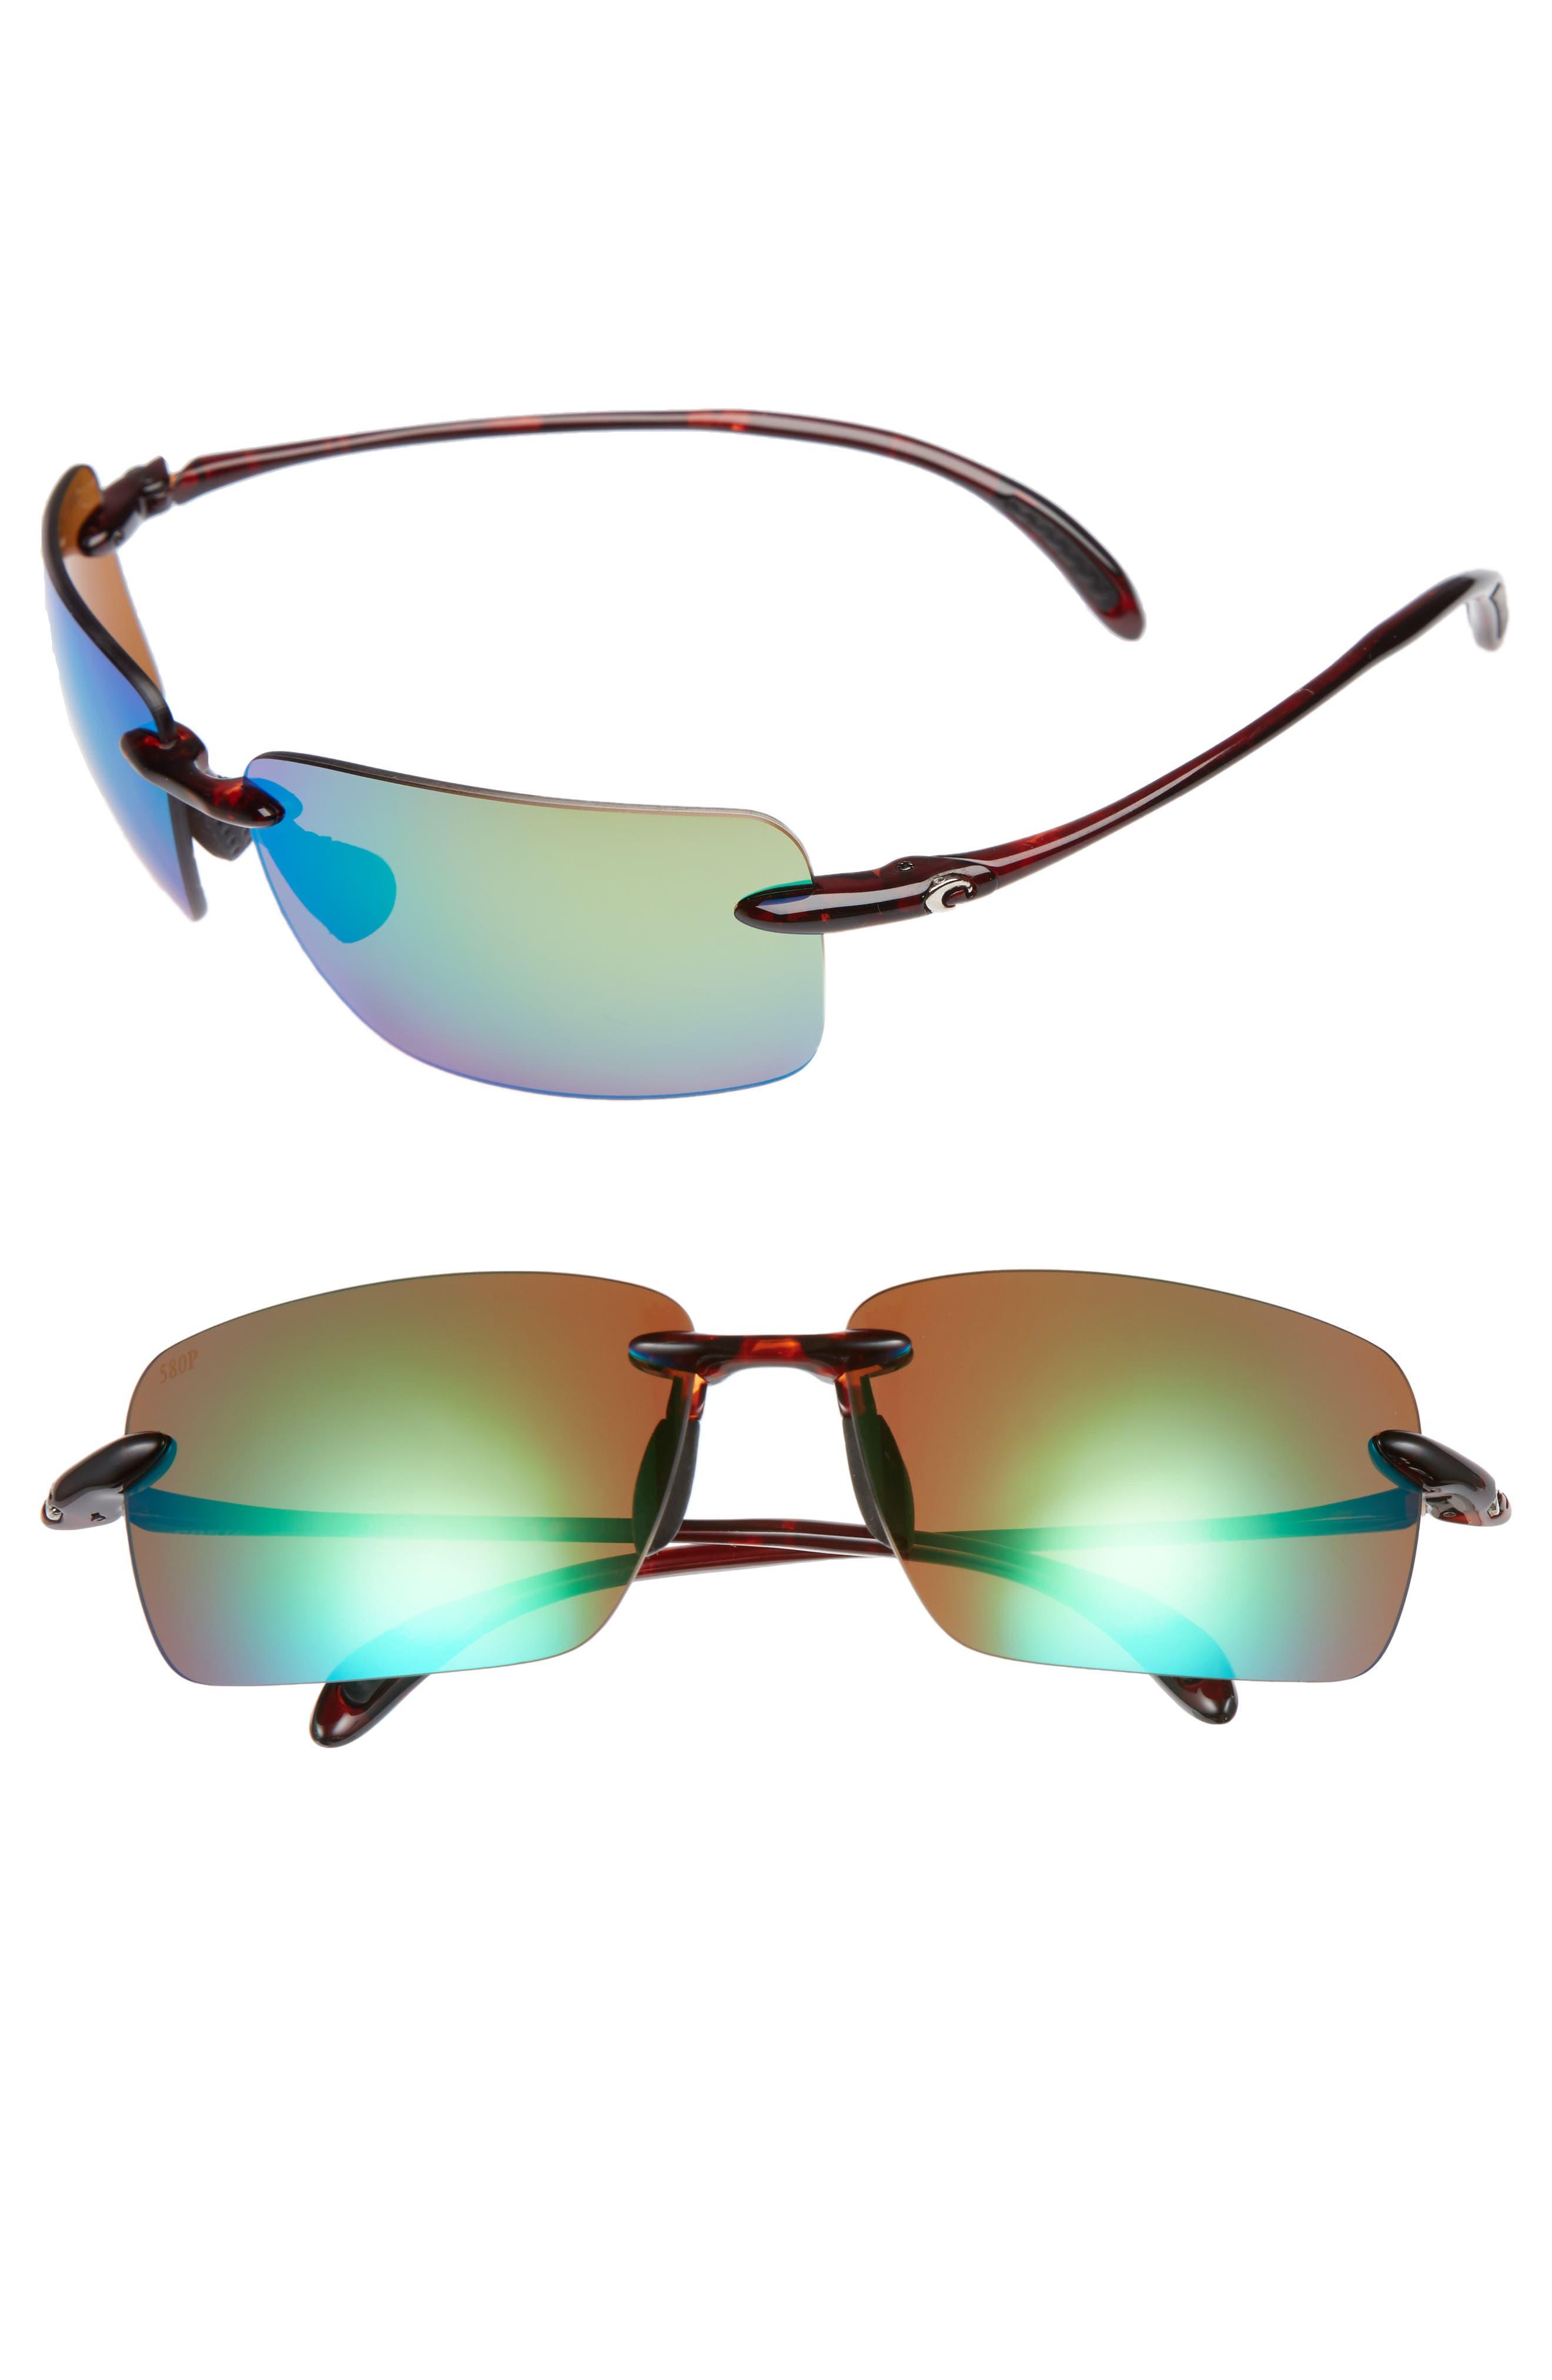 Gulfshore XL 66mm Polarized Sunglasses,                             Main thumbnail 1, color,                             Tortoise/ Green Mirror